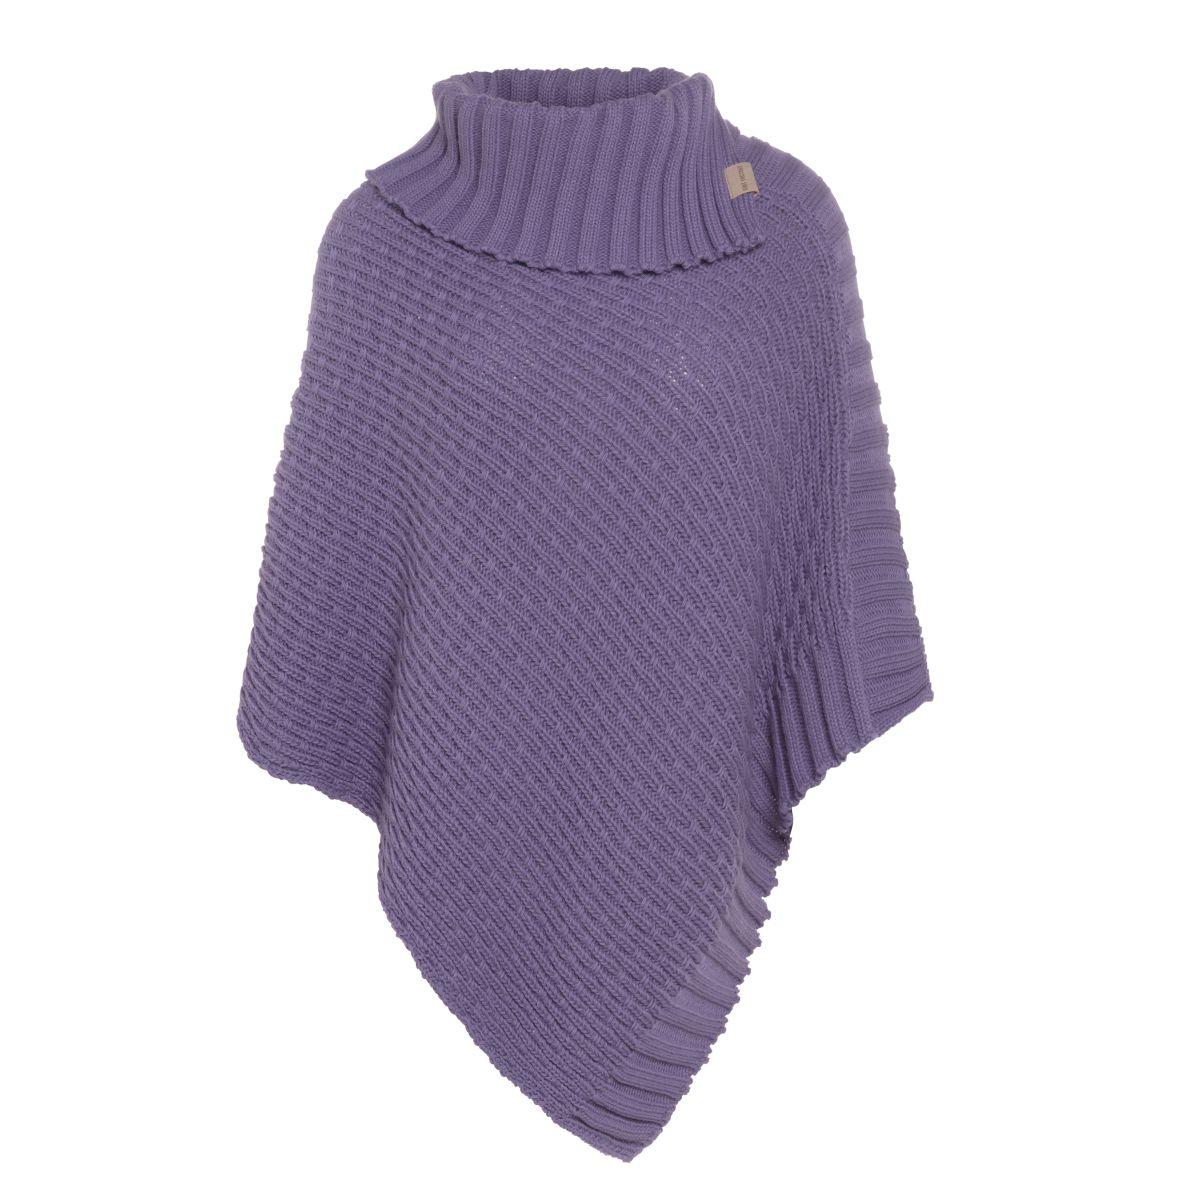 knit factory kf14806204350 nicky gebreide poncho violet 1